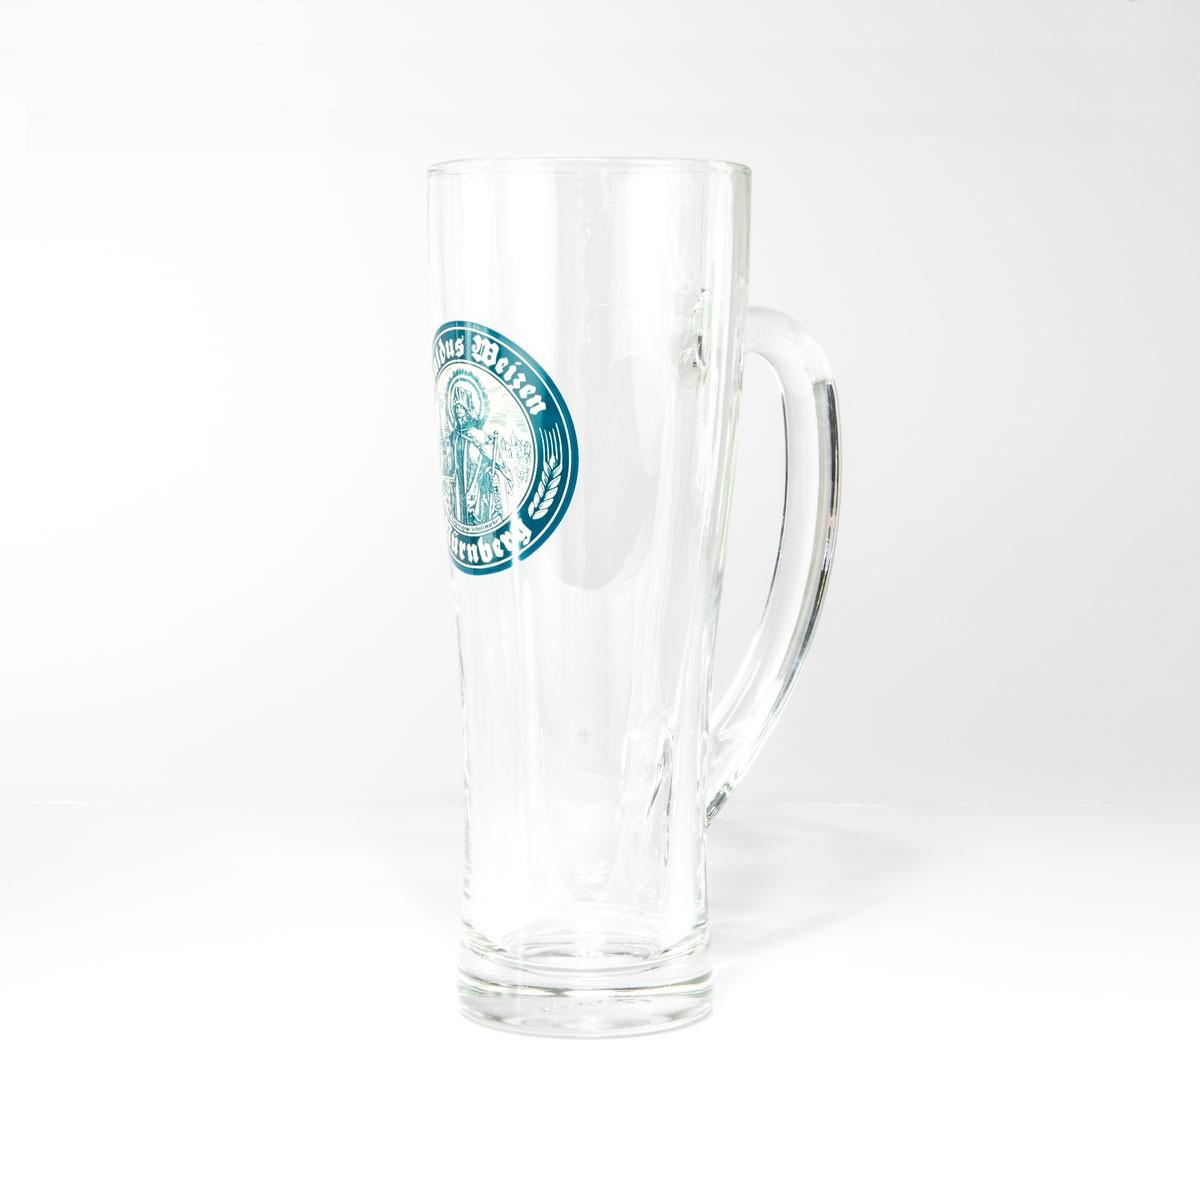 Sebaldus Weißbierglas 0,5 Liter